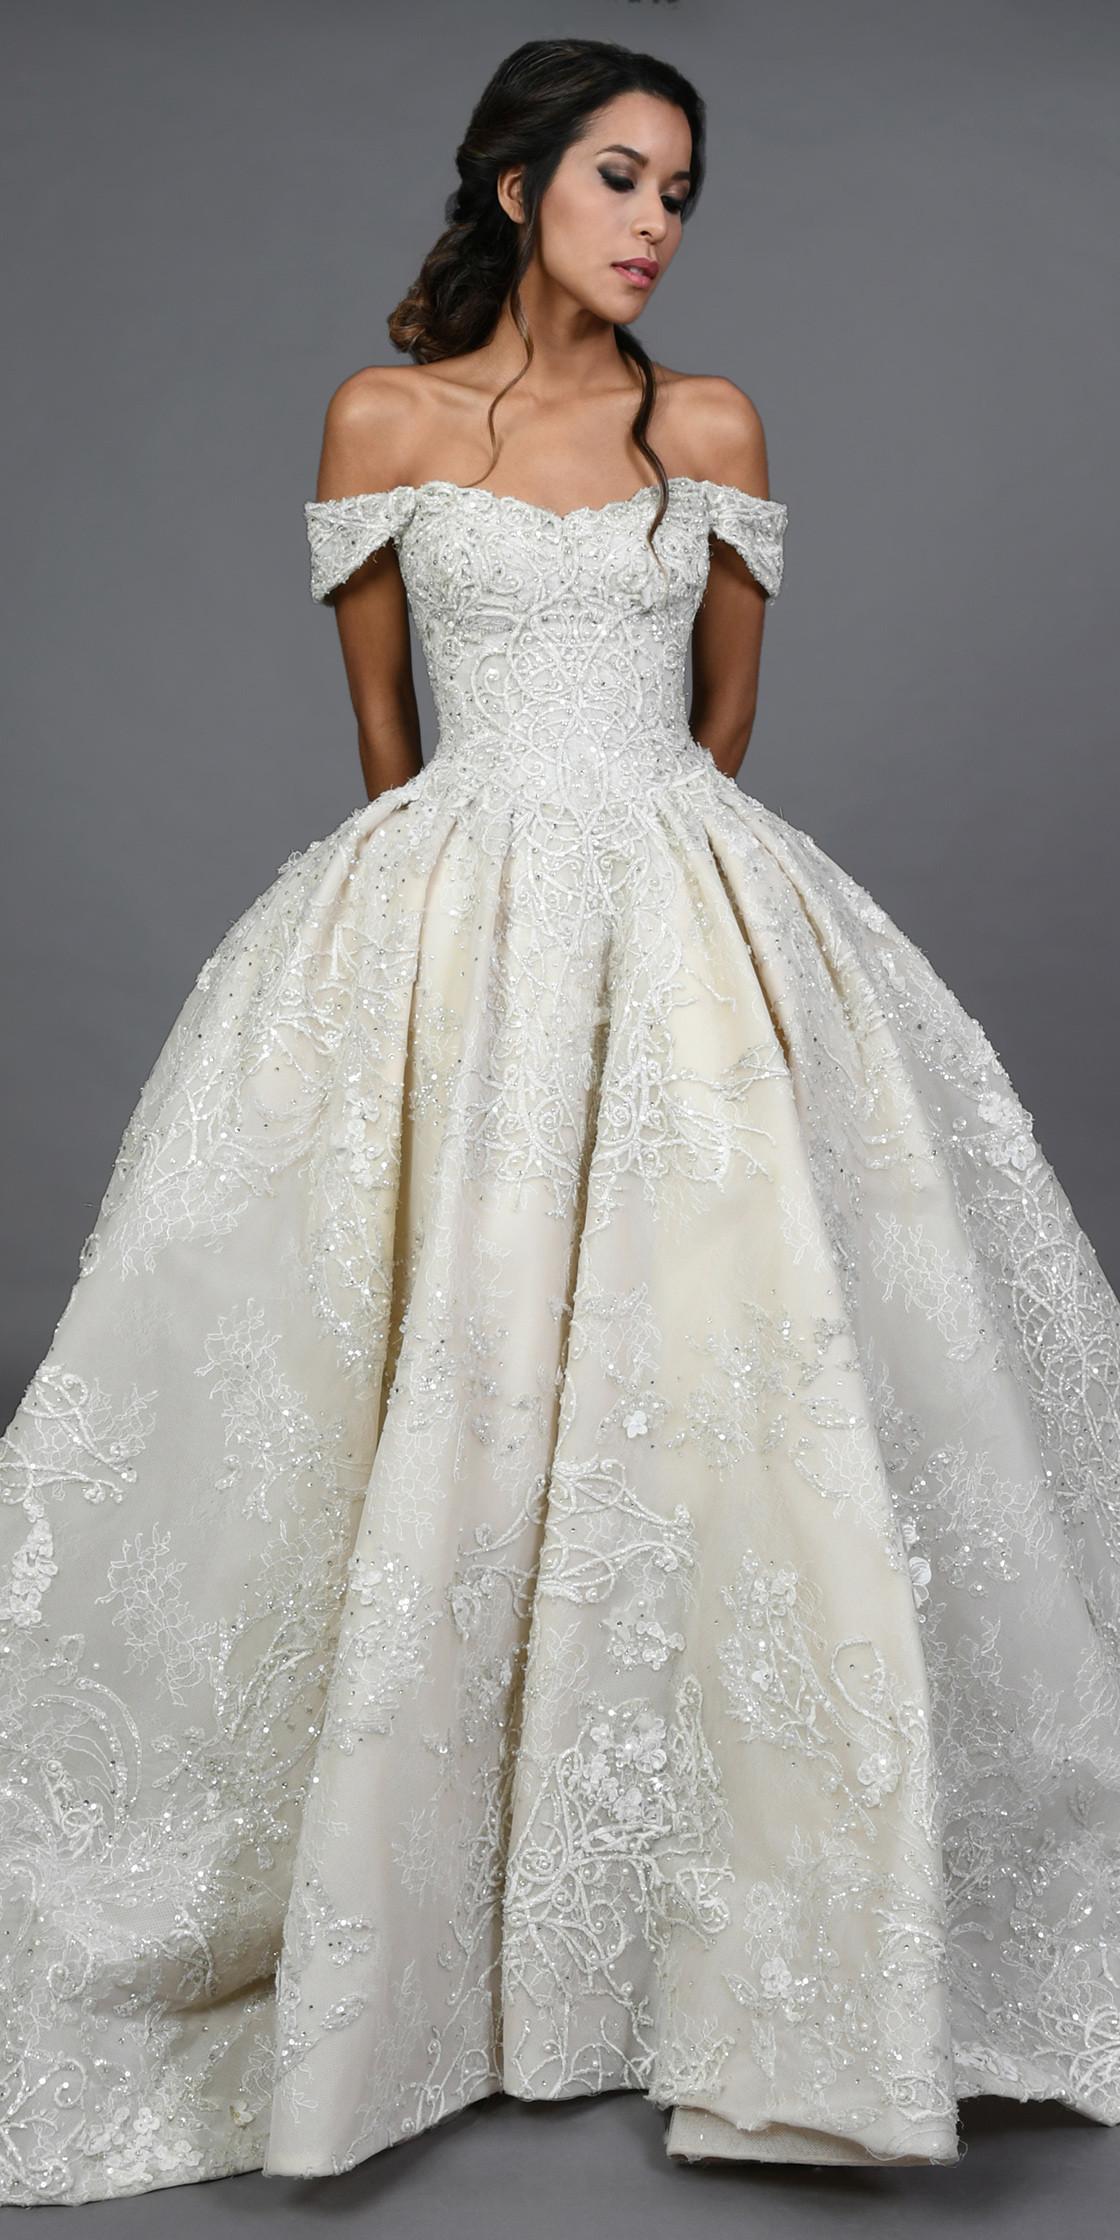 Ziad Nakad Off The Shoulder Princess Cut Gown Wedding Dress